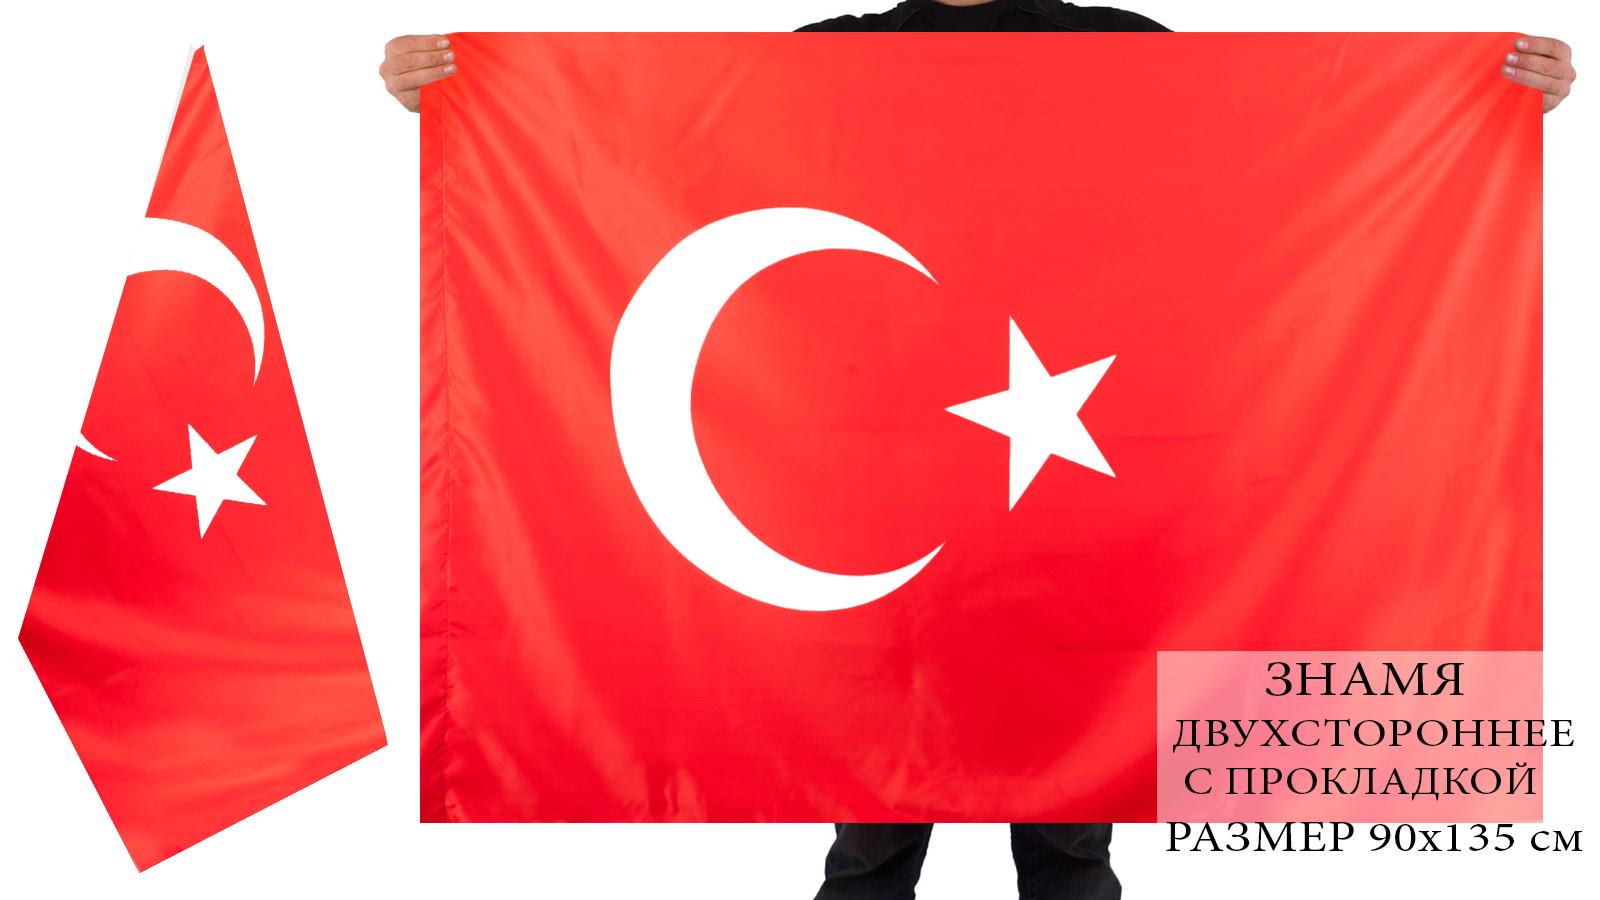 Значение и описание цветов флага Турции у нас на сайте